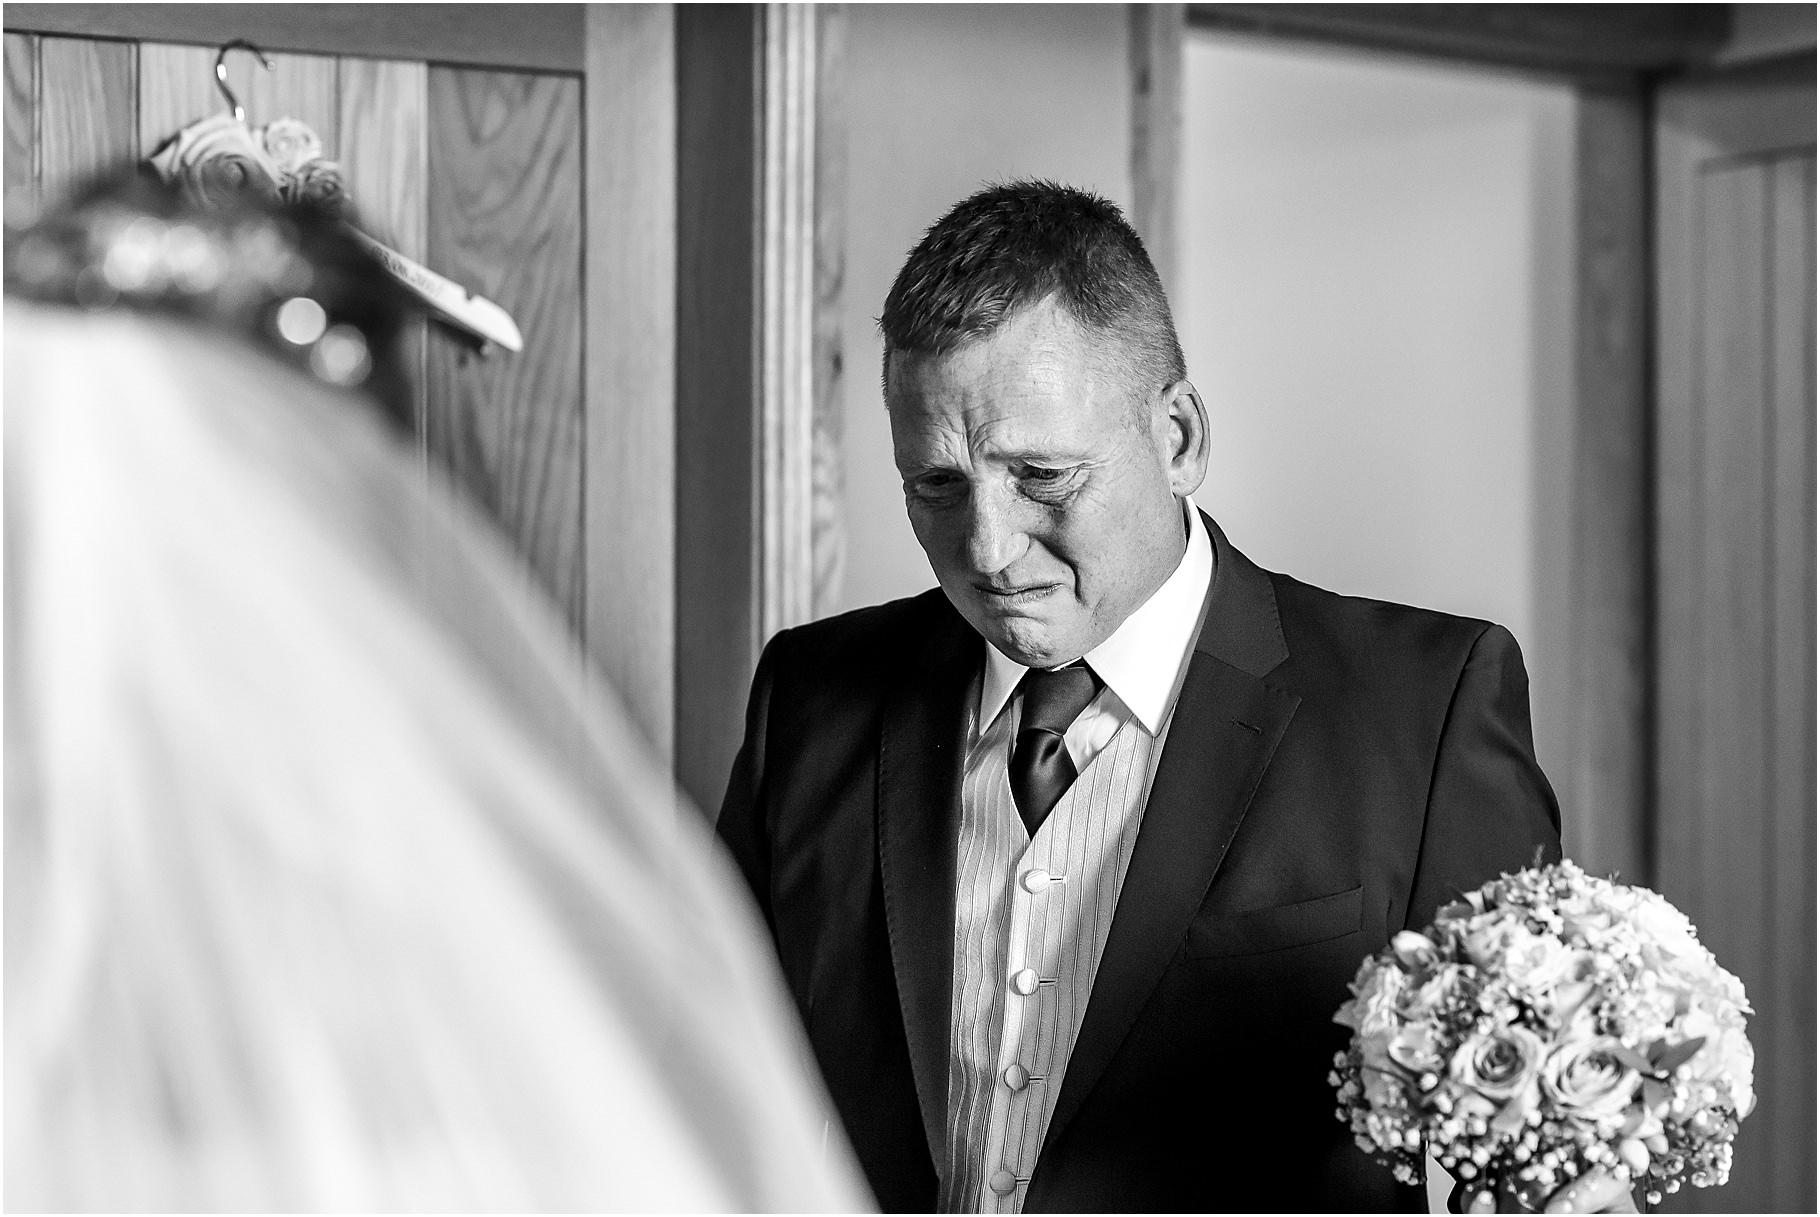 dan-wootton-photography-2017-weddings-189.jpg